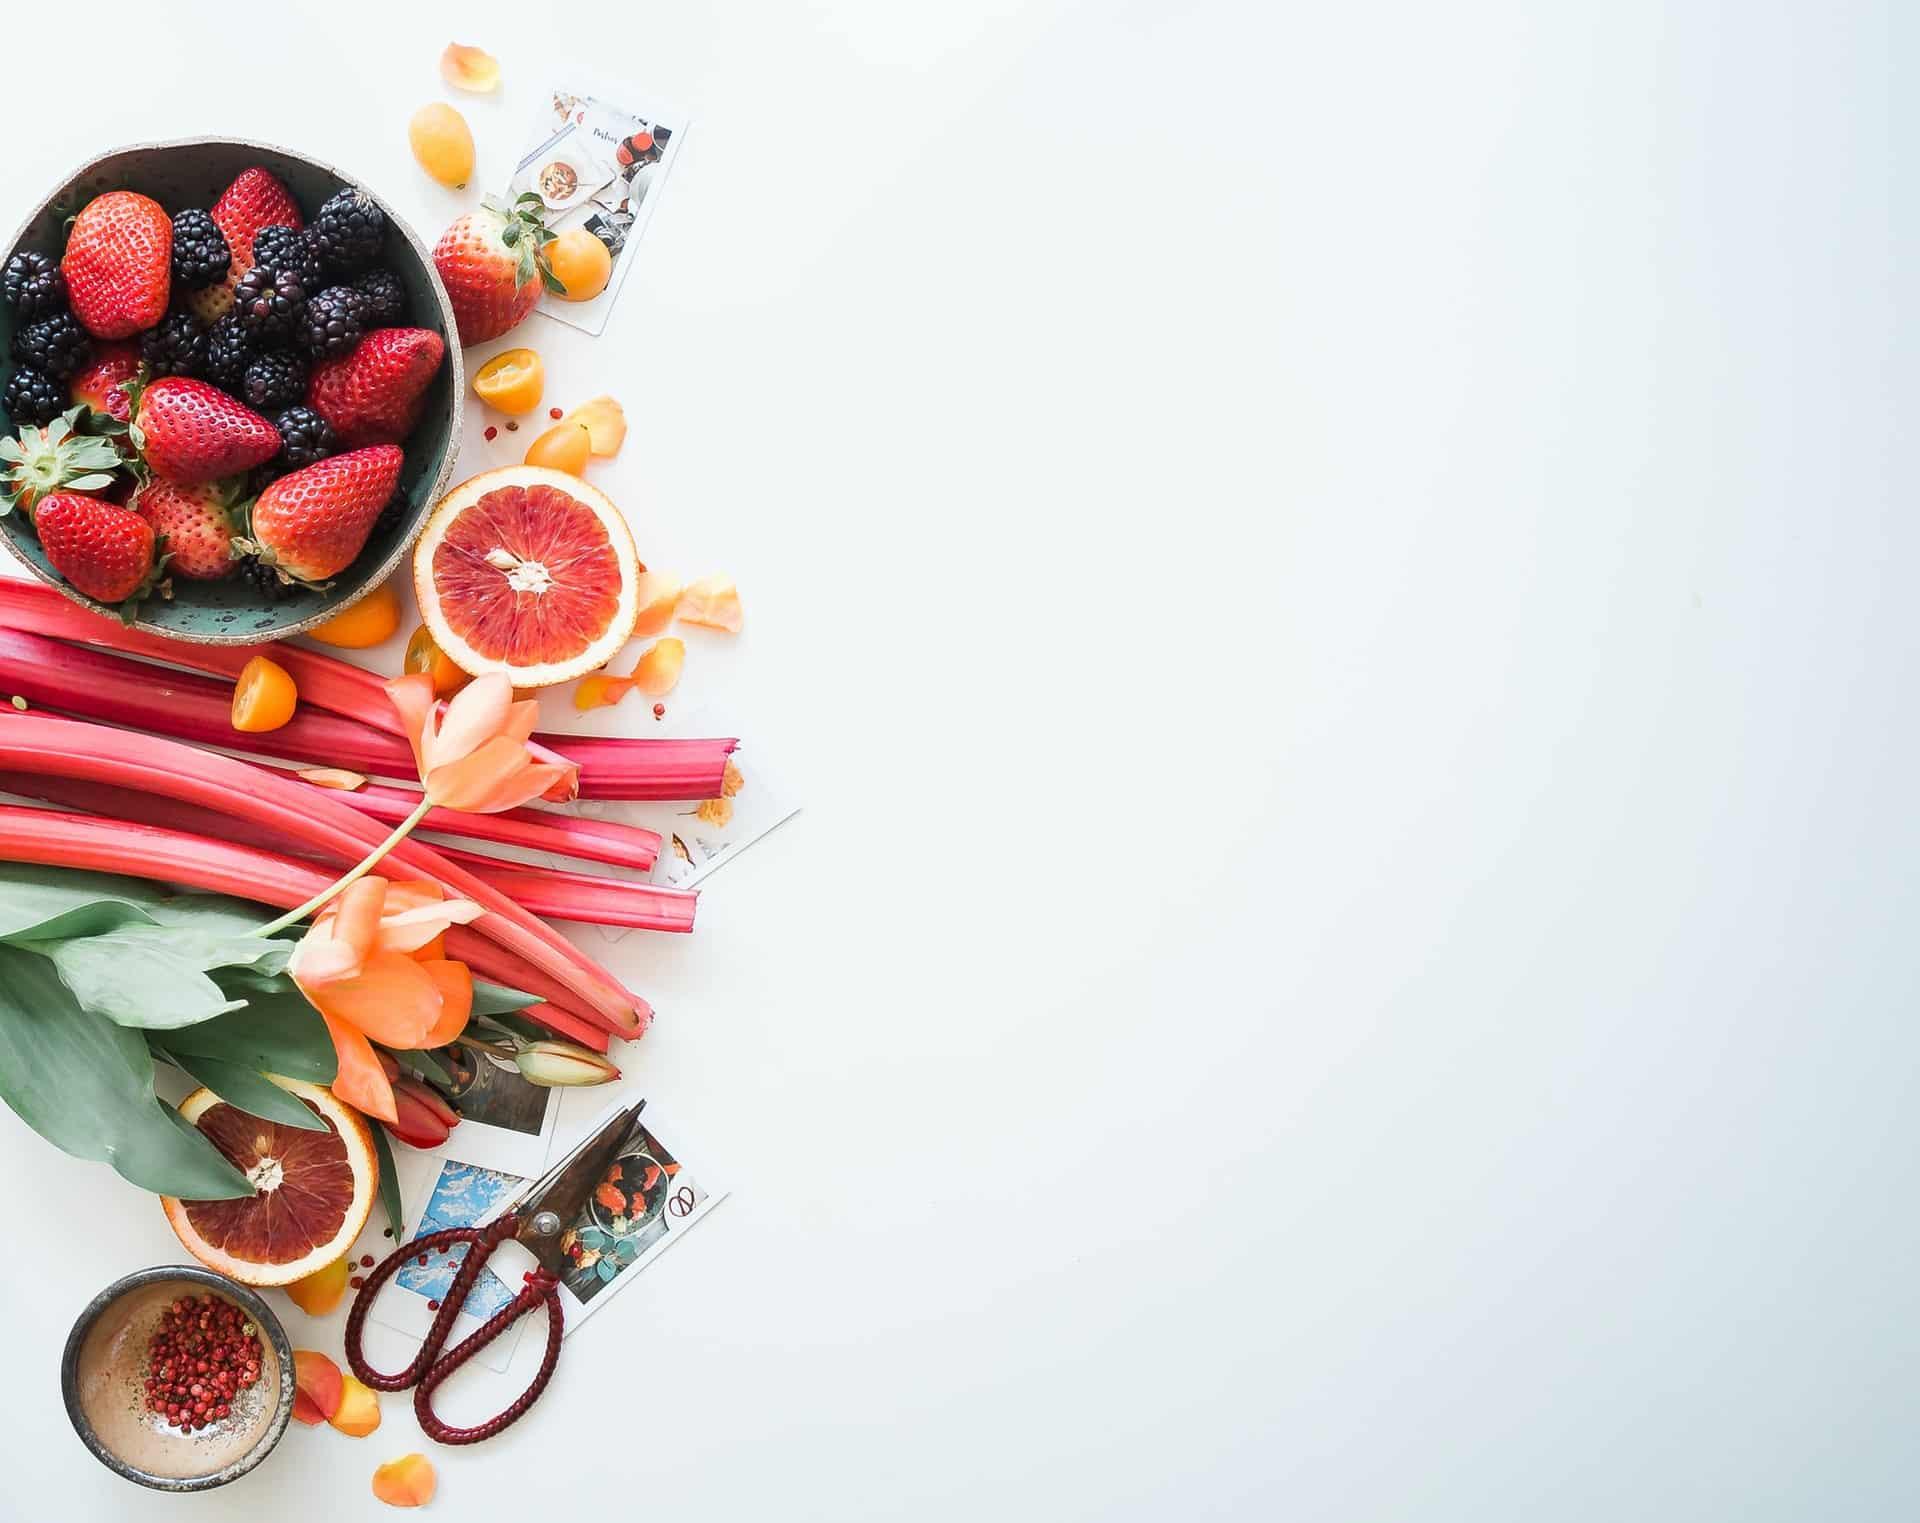 Vegan Eletmod Novenyi Etrend Menopauza Egeszseg